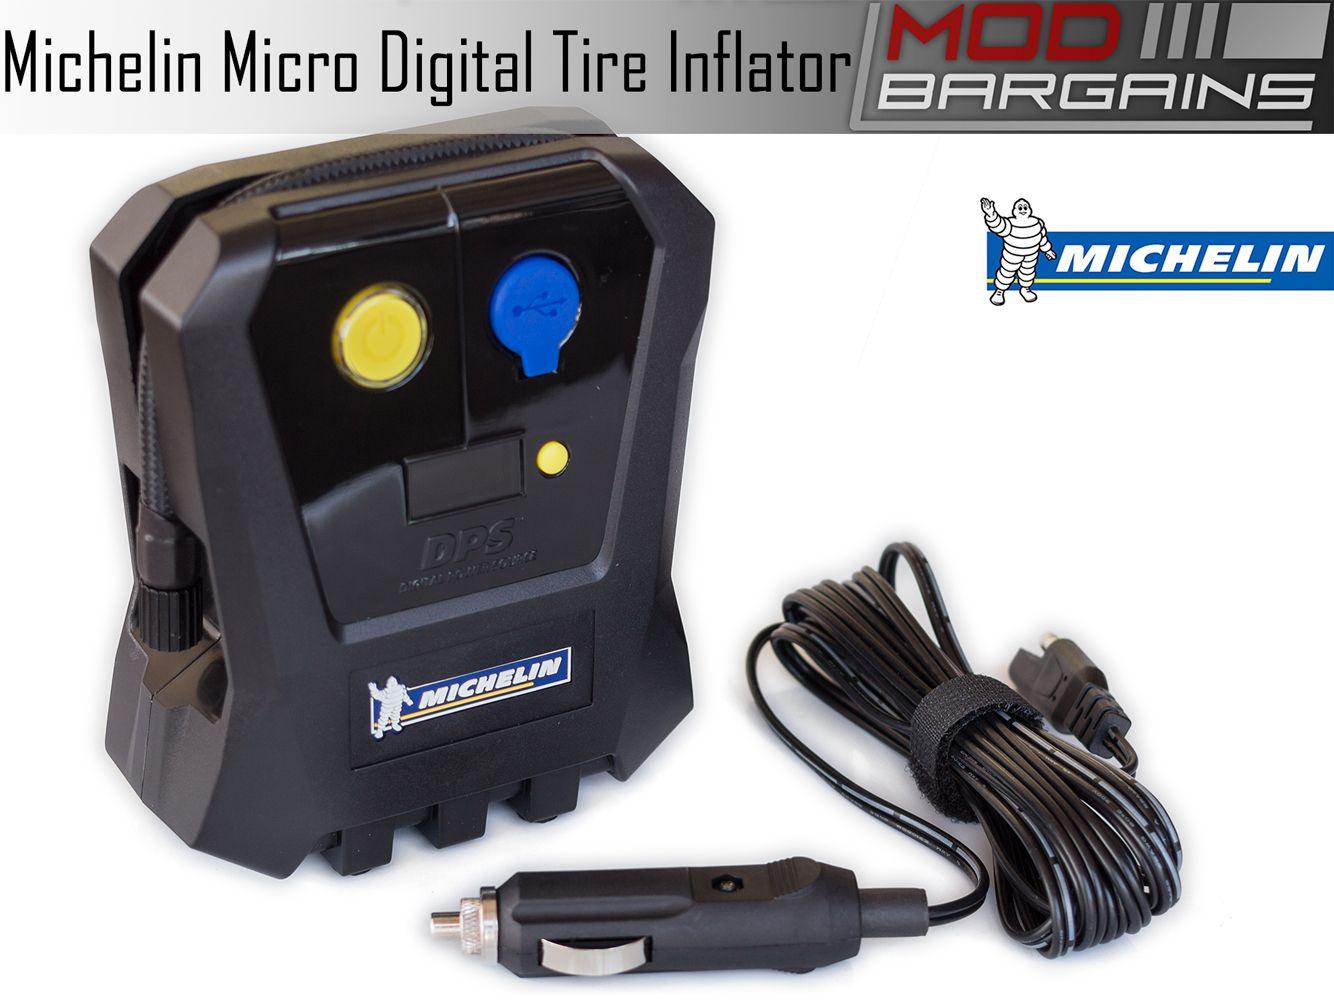 Michelin Micro 12 Volt Digital Tire Inflator